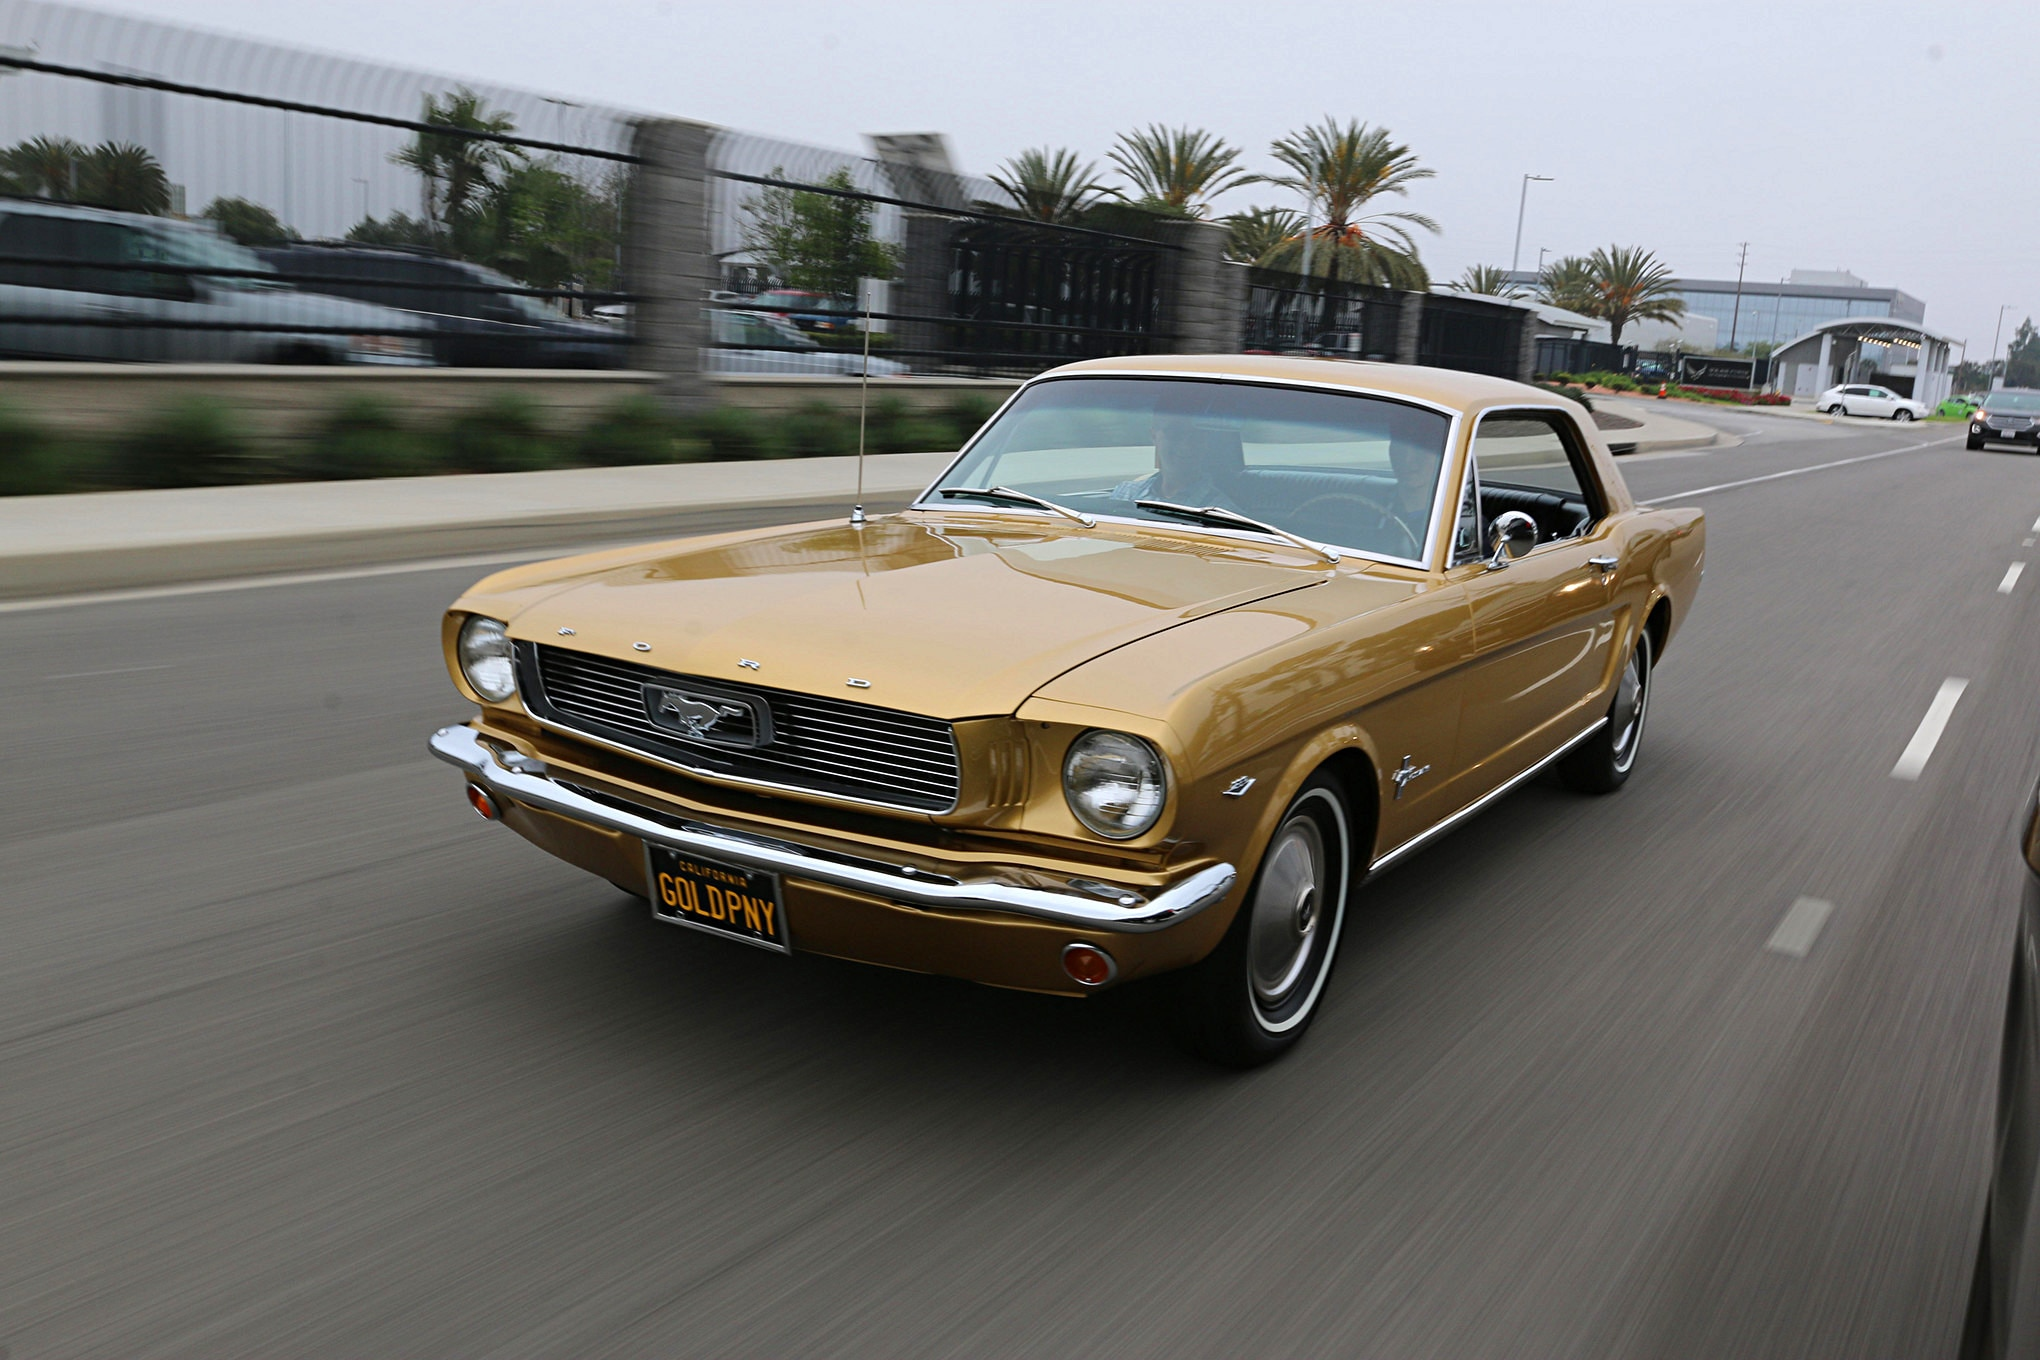 Golden Anniversary Mustang 024